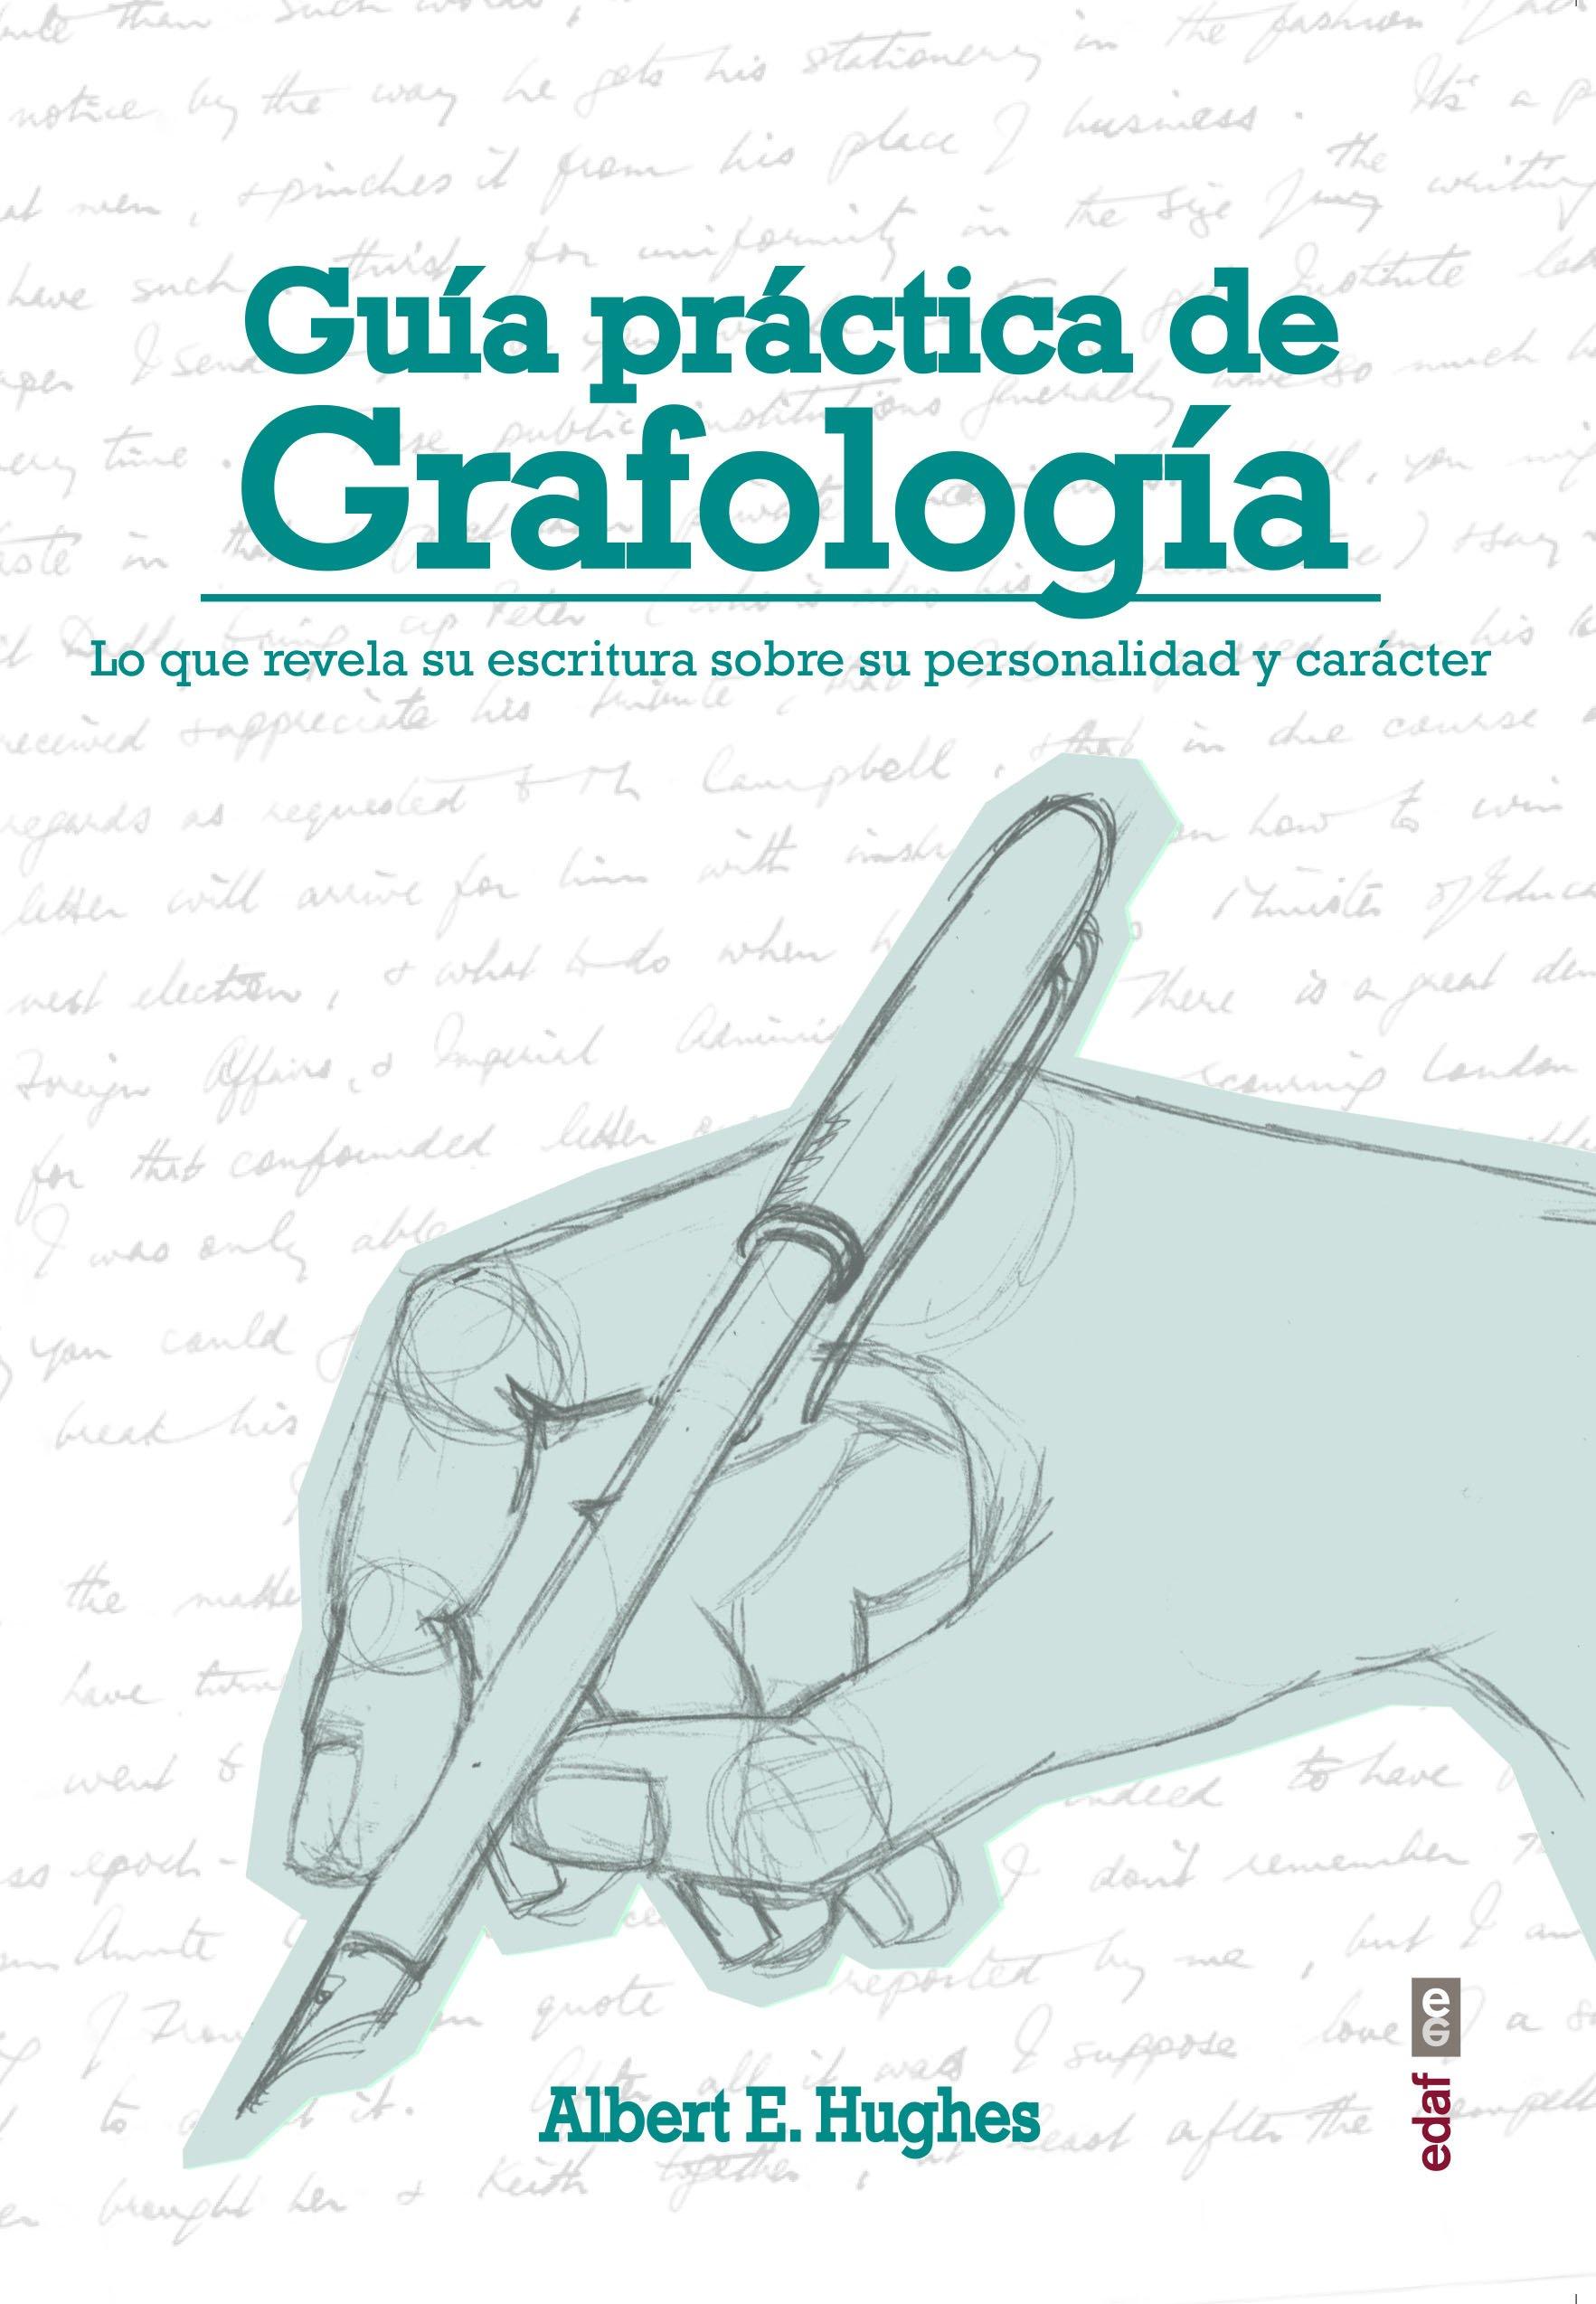 Guia practica de grafologia (Spanish Edition)